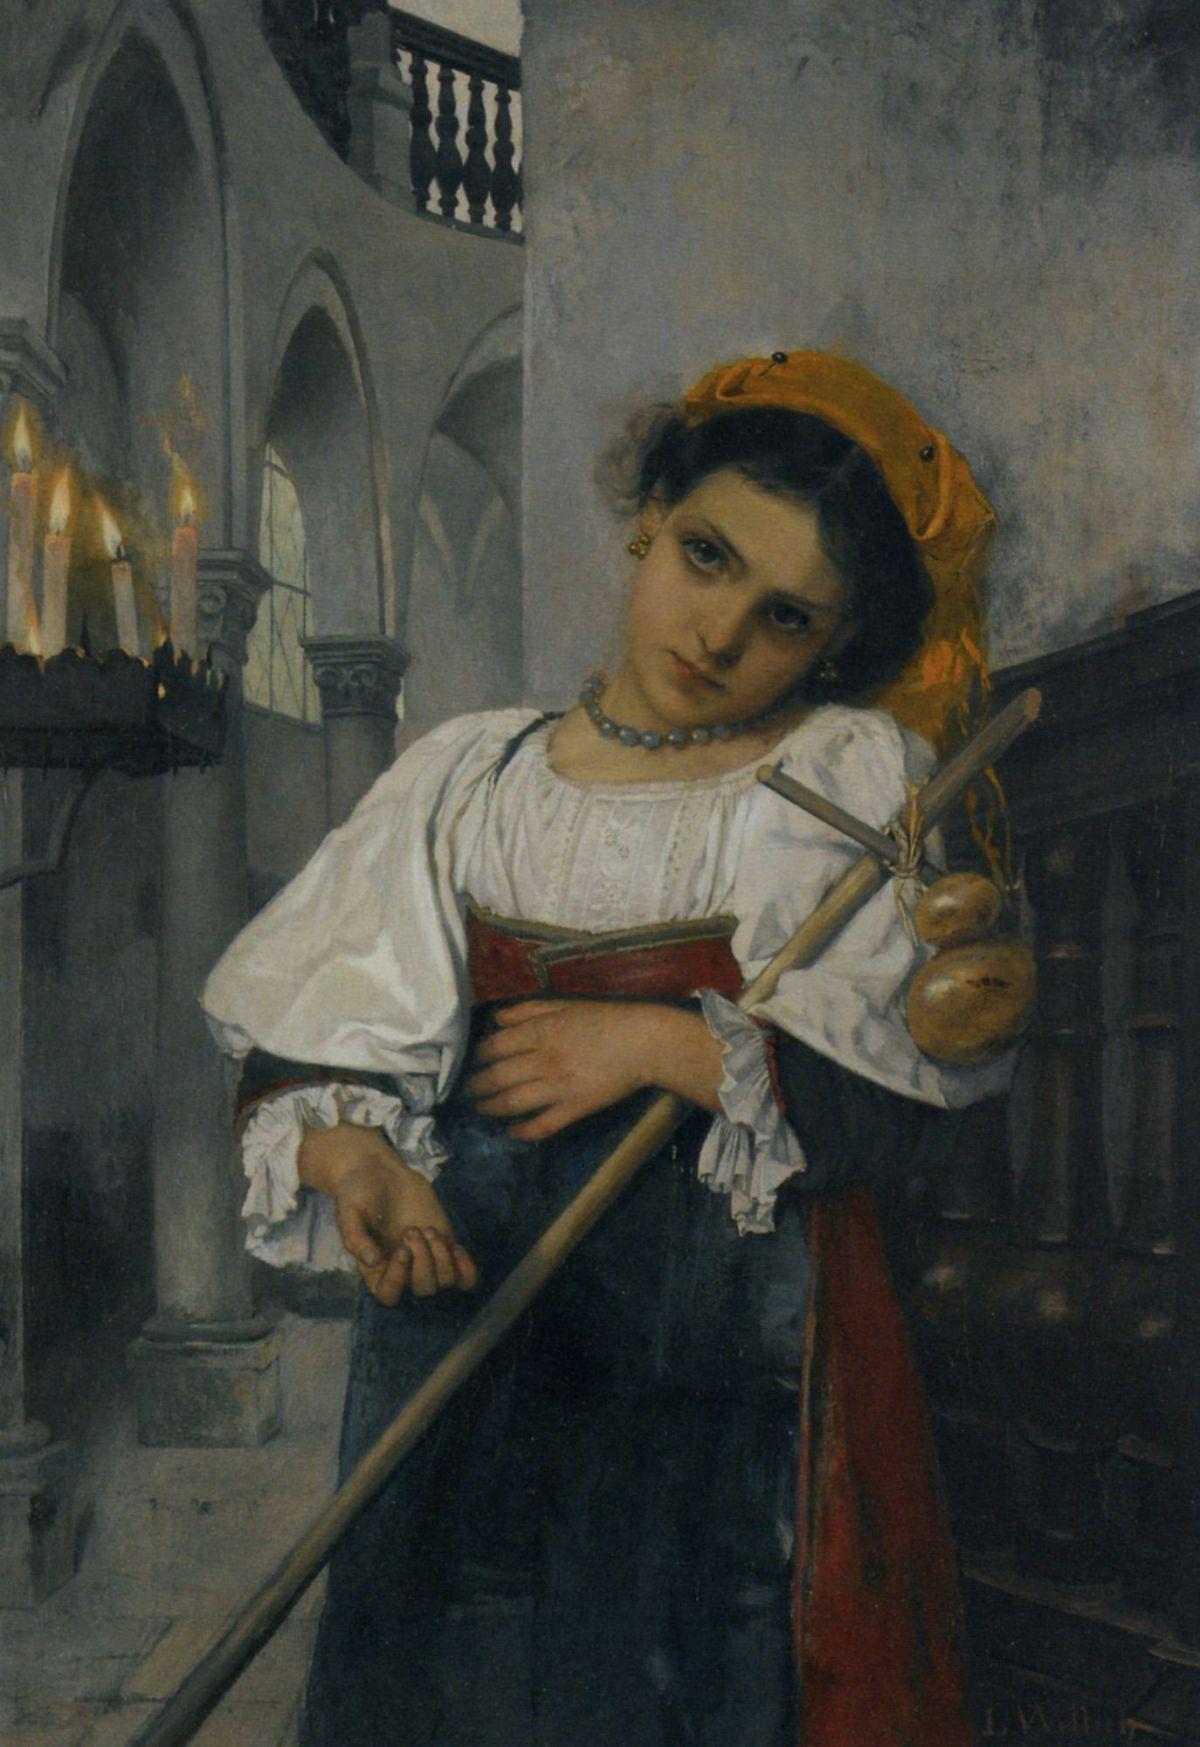 Lost in Daydreams by Heinrich Ludwig Wittich